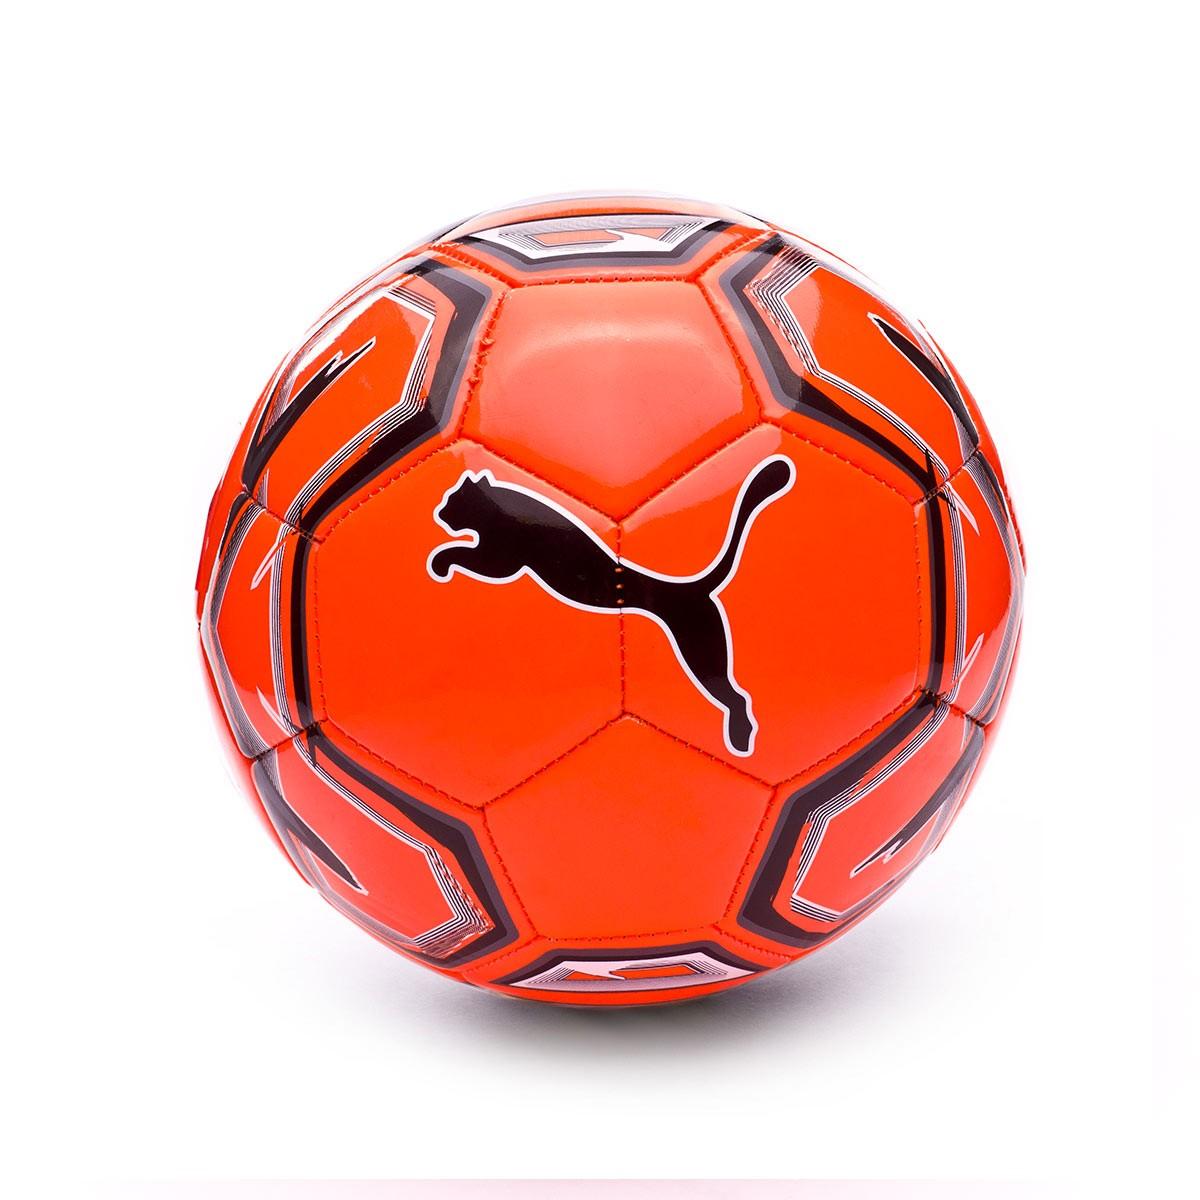 aec95db77 Pallone Puma Futsal 1 Trainer MS Shocking orange-Puma black-Puma white -  Negozio di calcio Fútbol Emotion